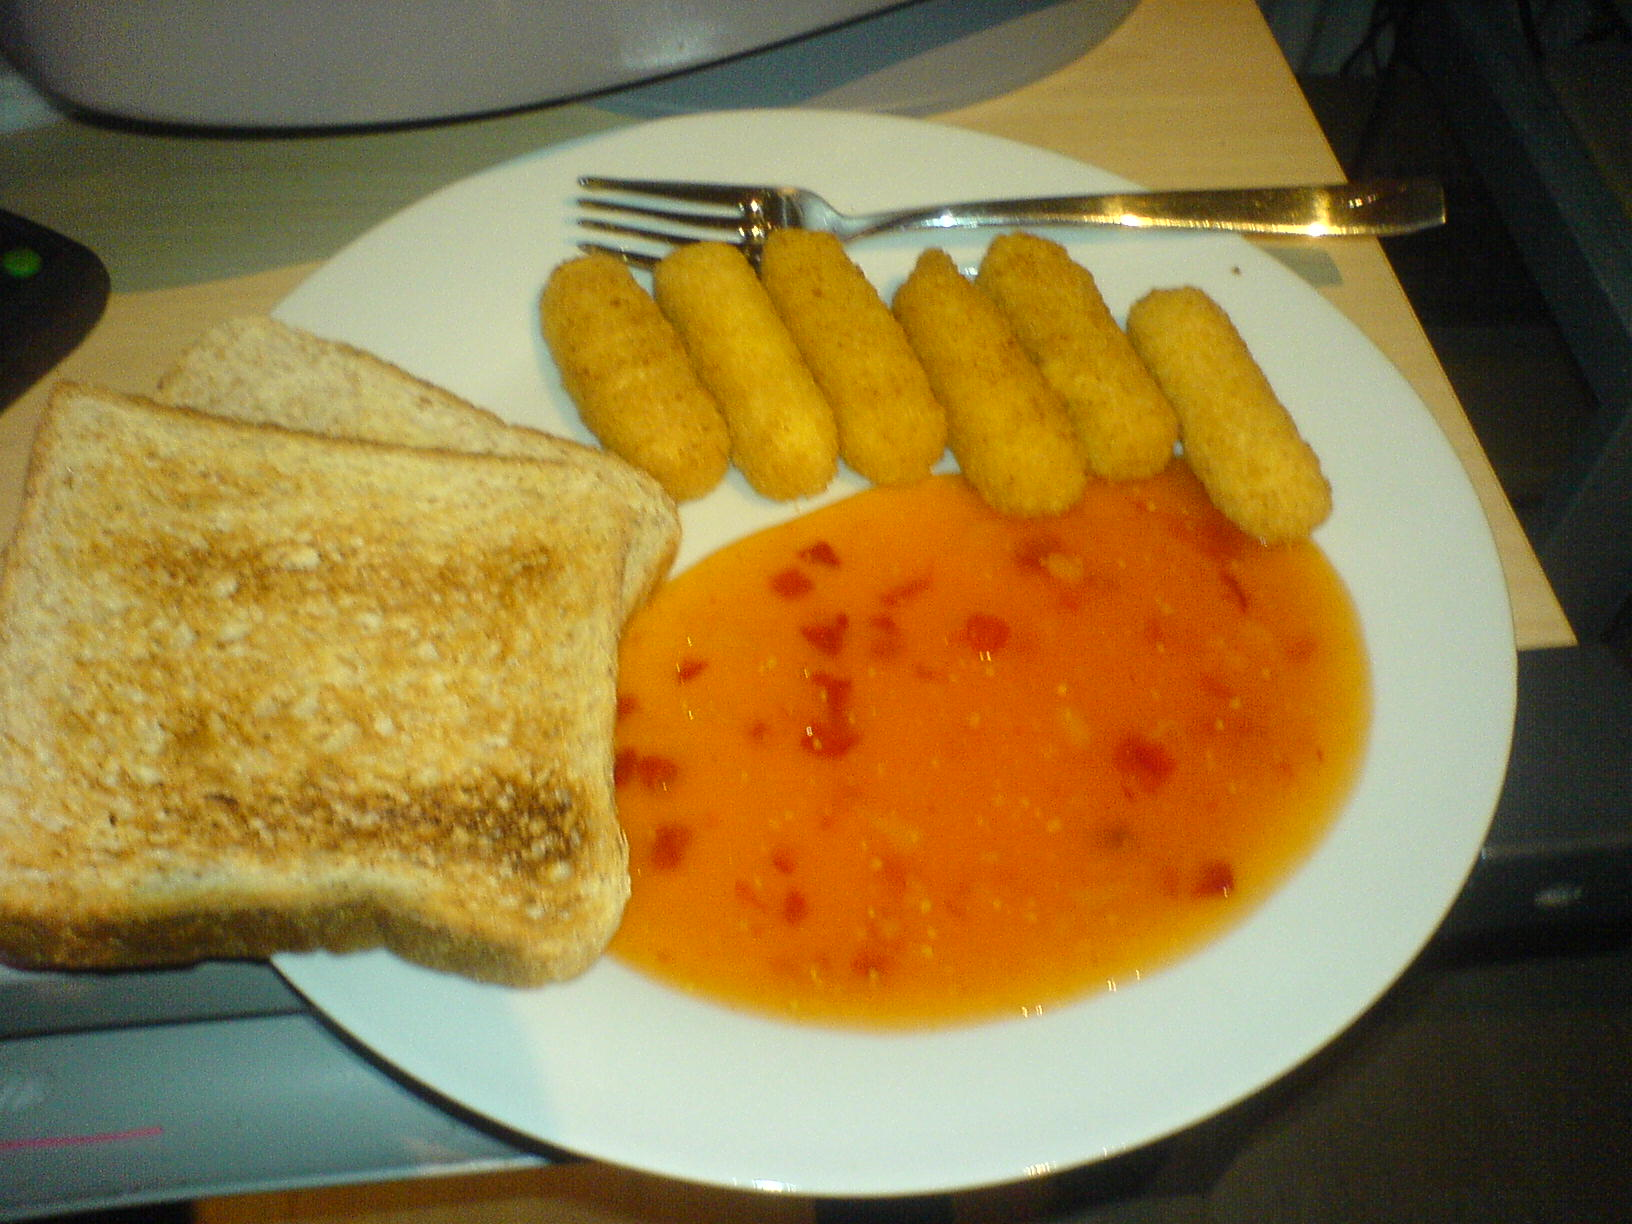 http://foodloader.net/Holz_2009-04-29_Frischkaese-Sticks_mit_Toasts.jpg